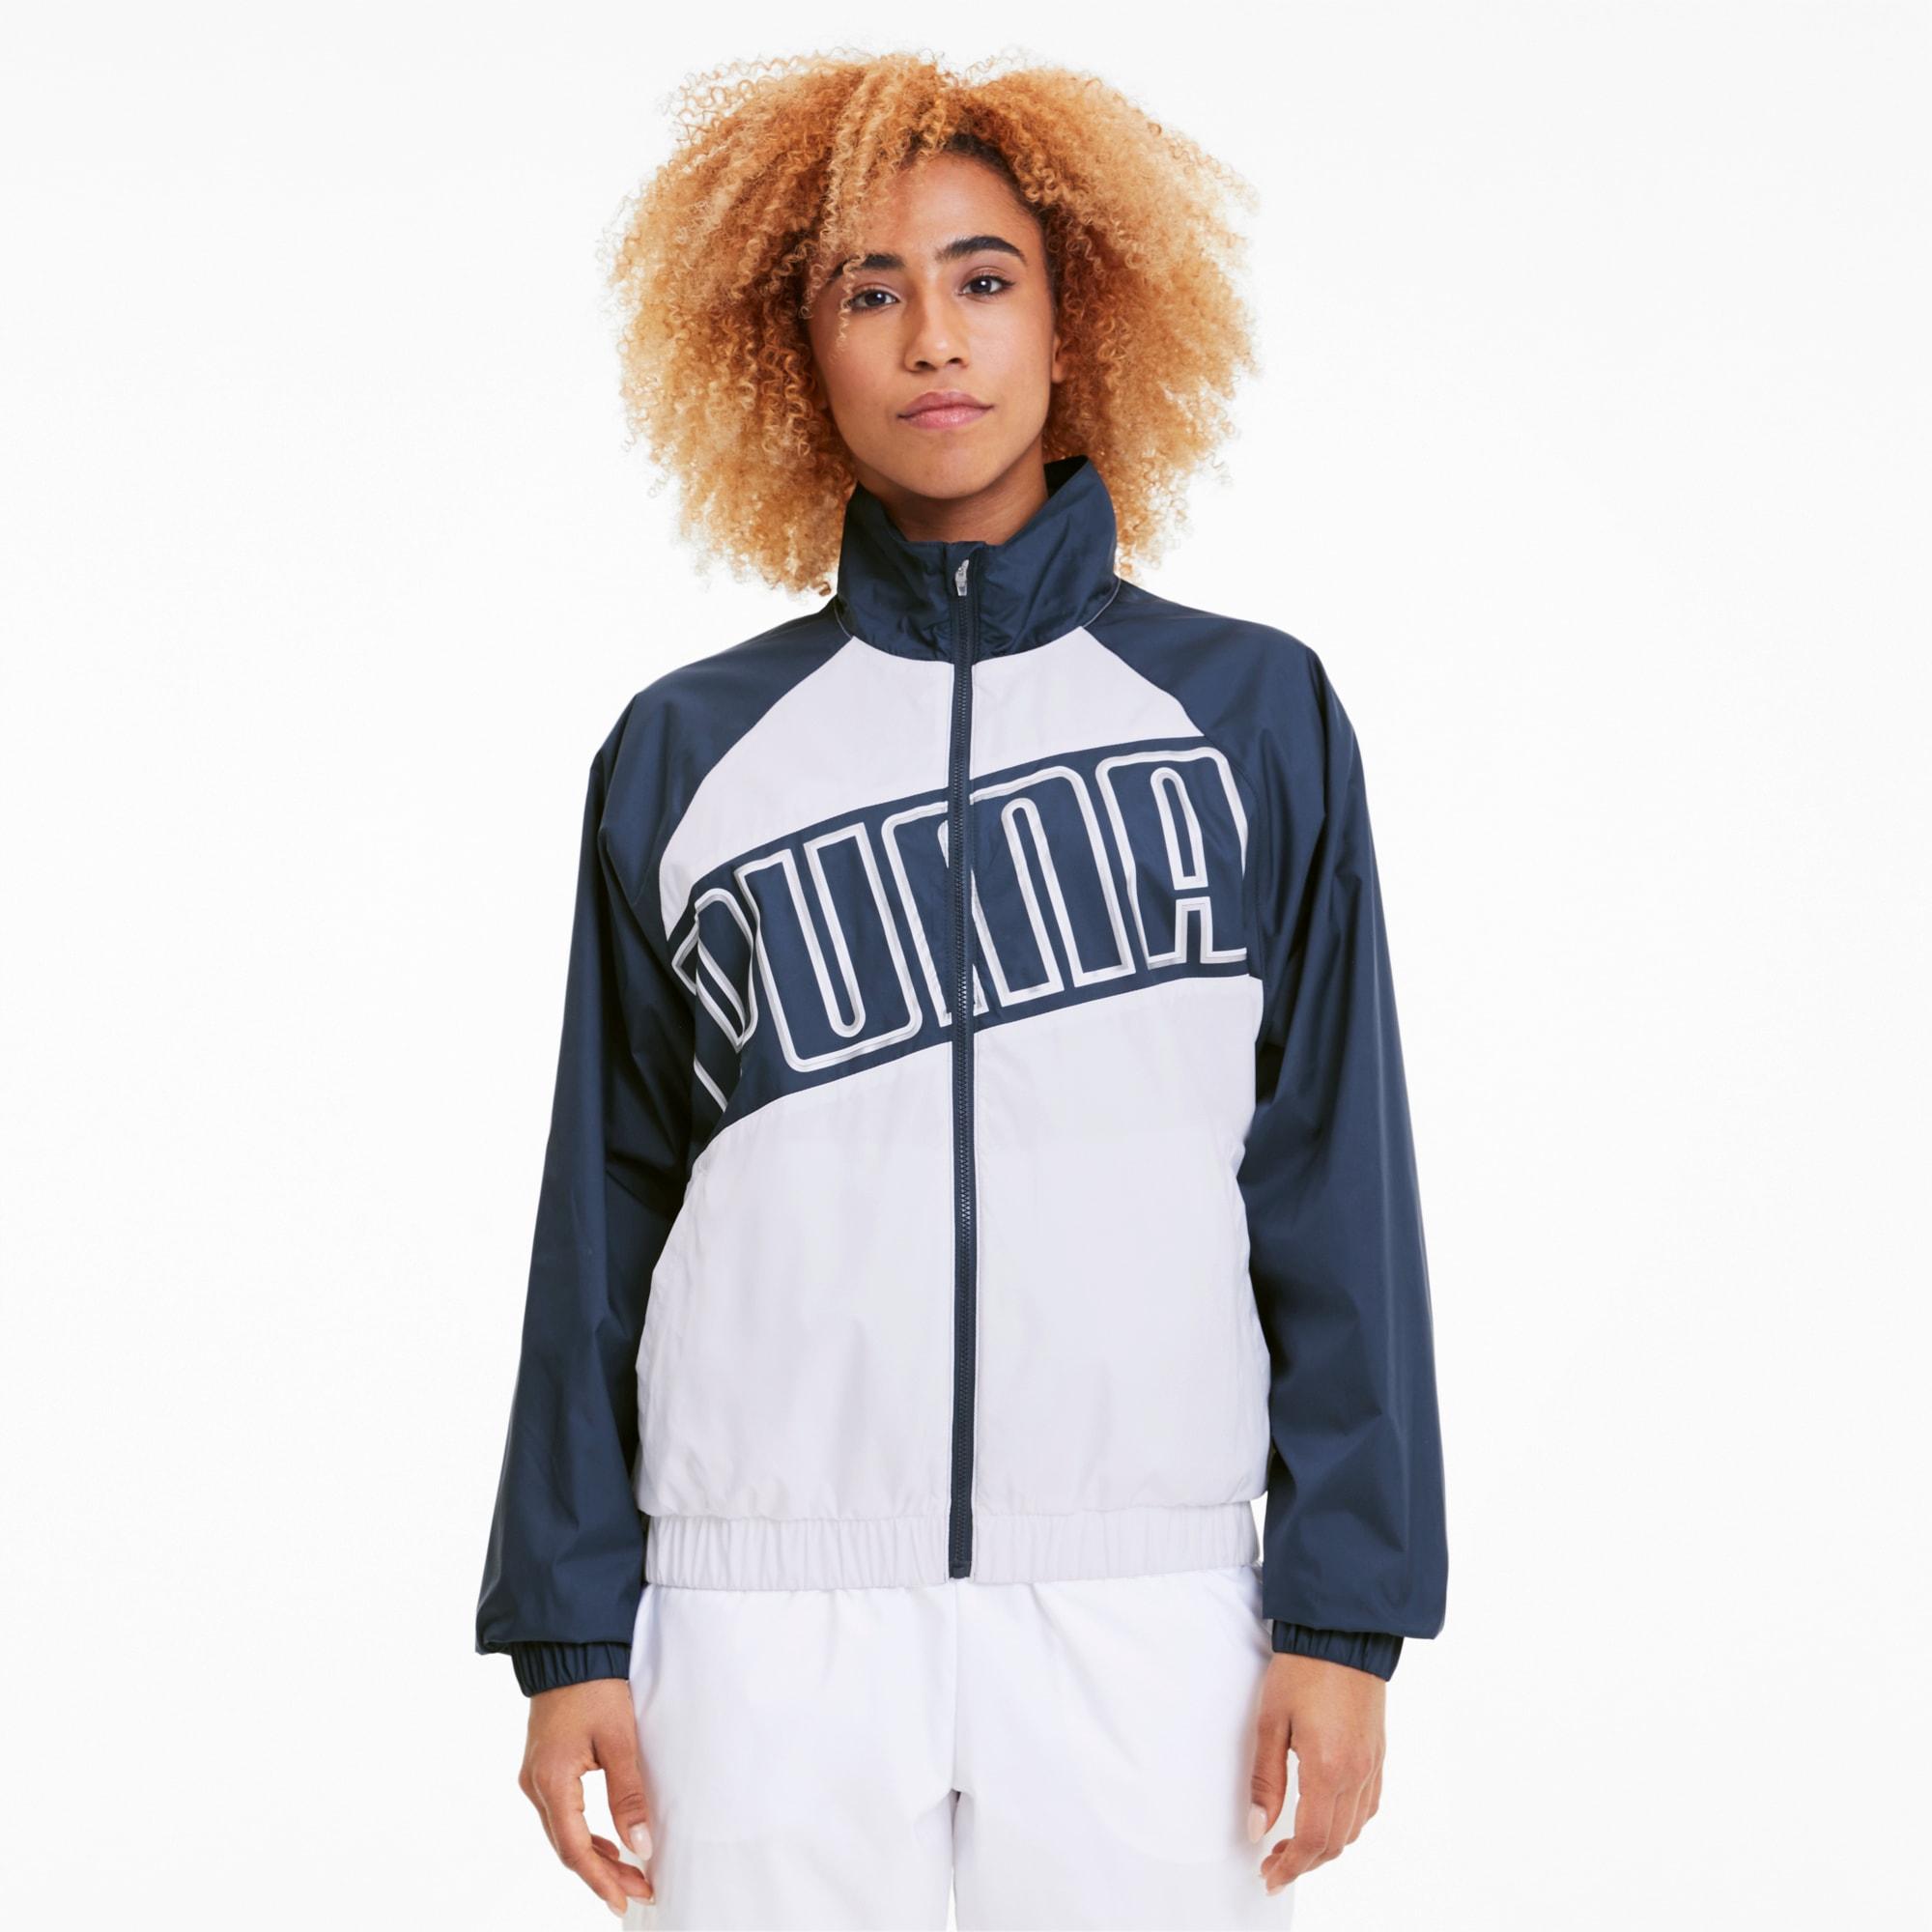 puma -  Feel It Damen Training Gewebter Windbreaker | Mit Aucun | Weiß/Blau | Größe: S